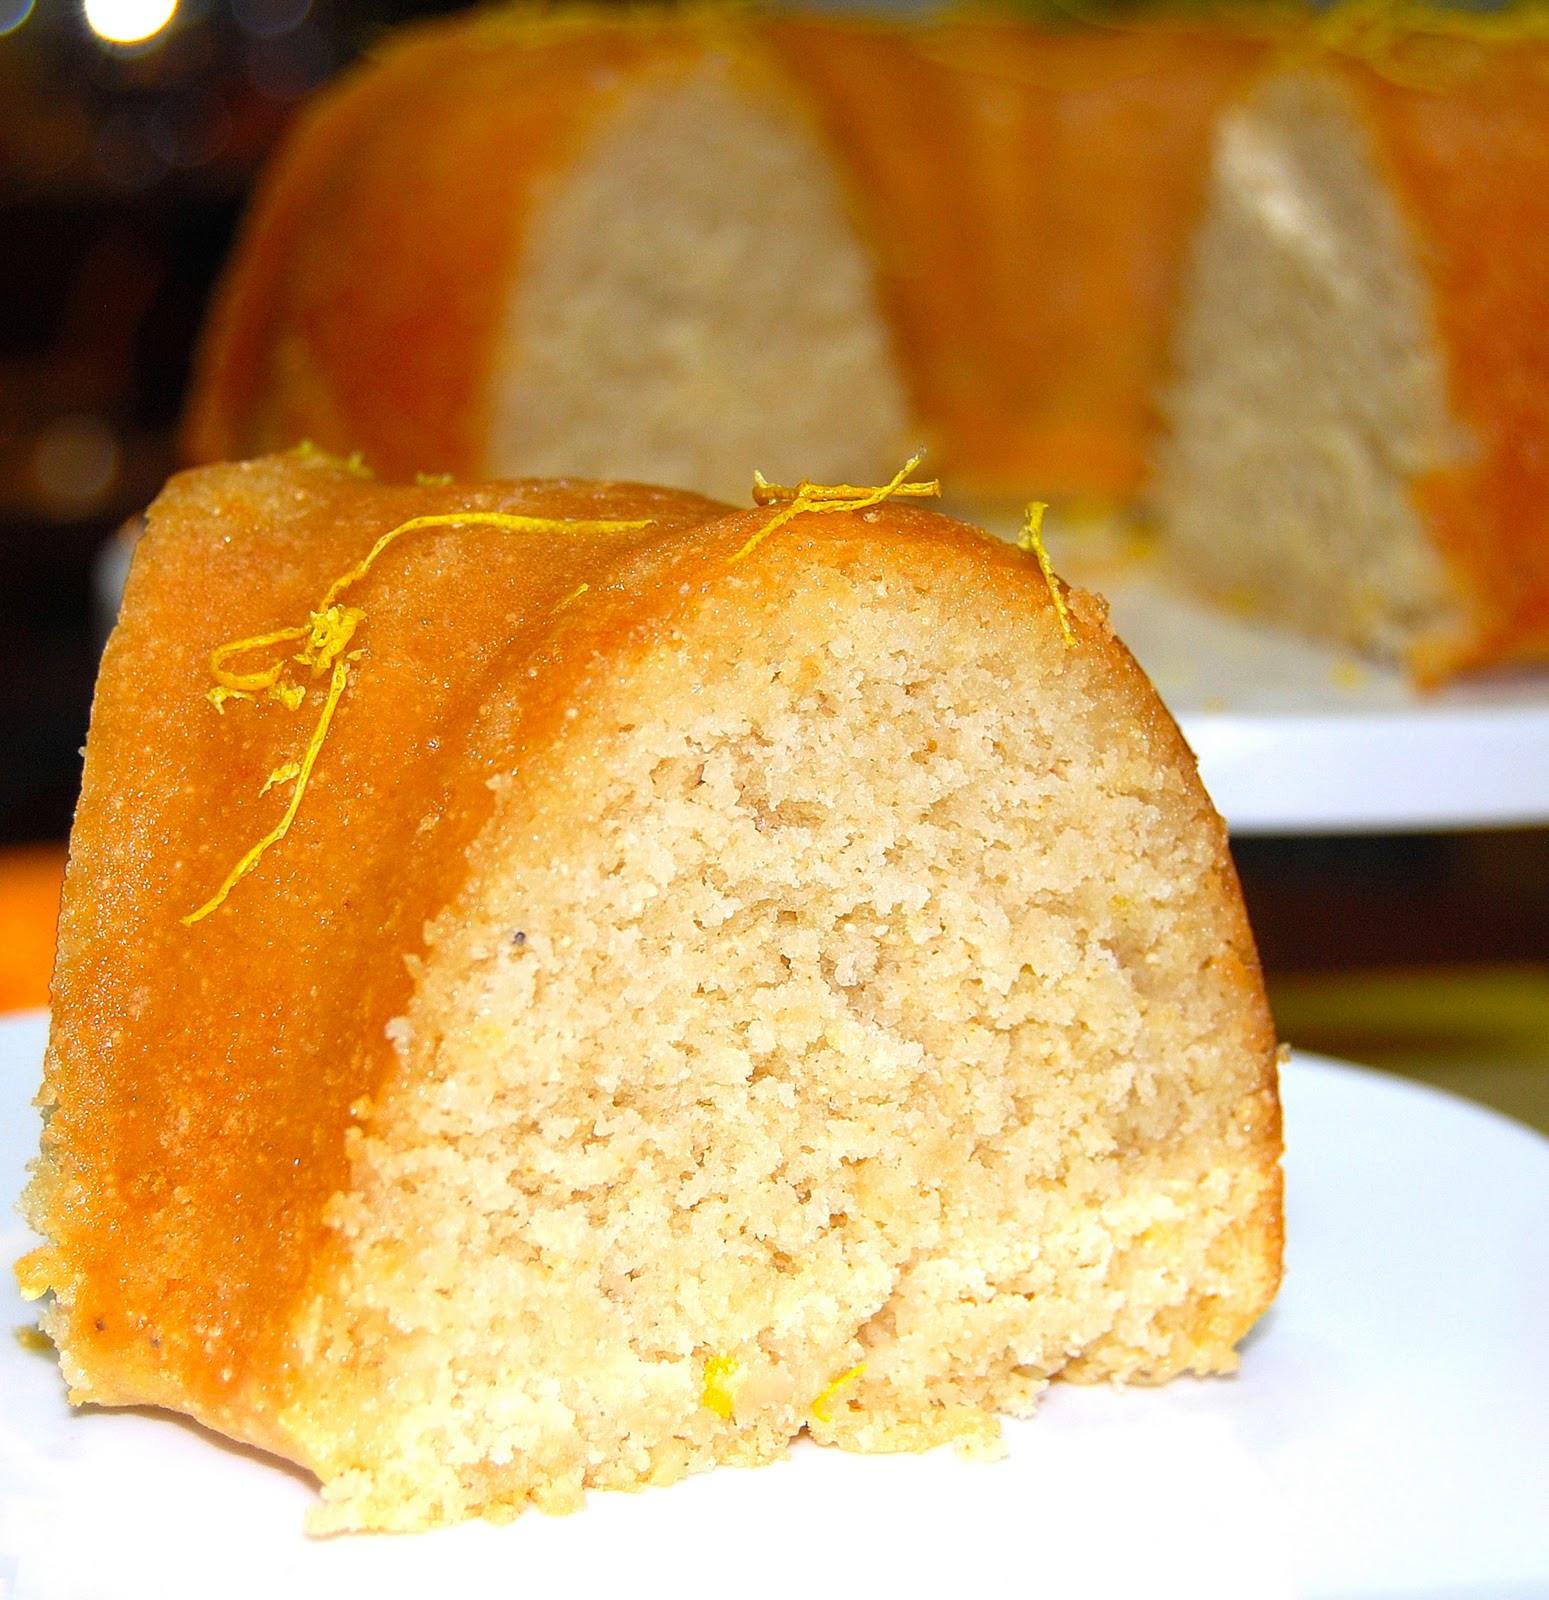 Vegan Lemon Cake Recipes  Vegan Lemon Poppy Seed Cake Holy Cow Vegan Recipes